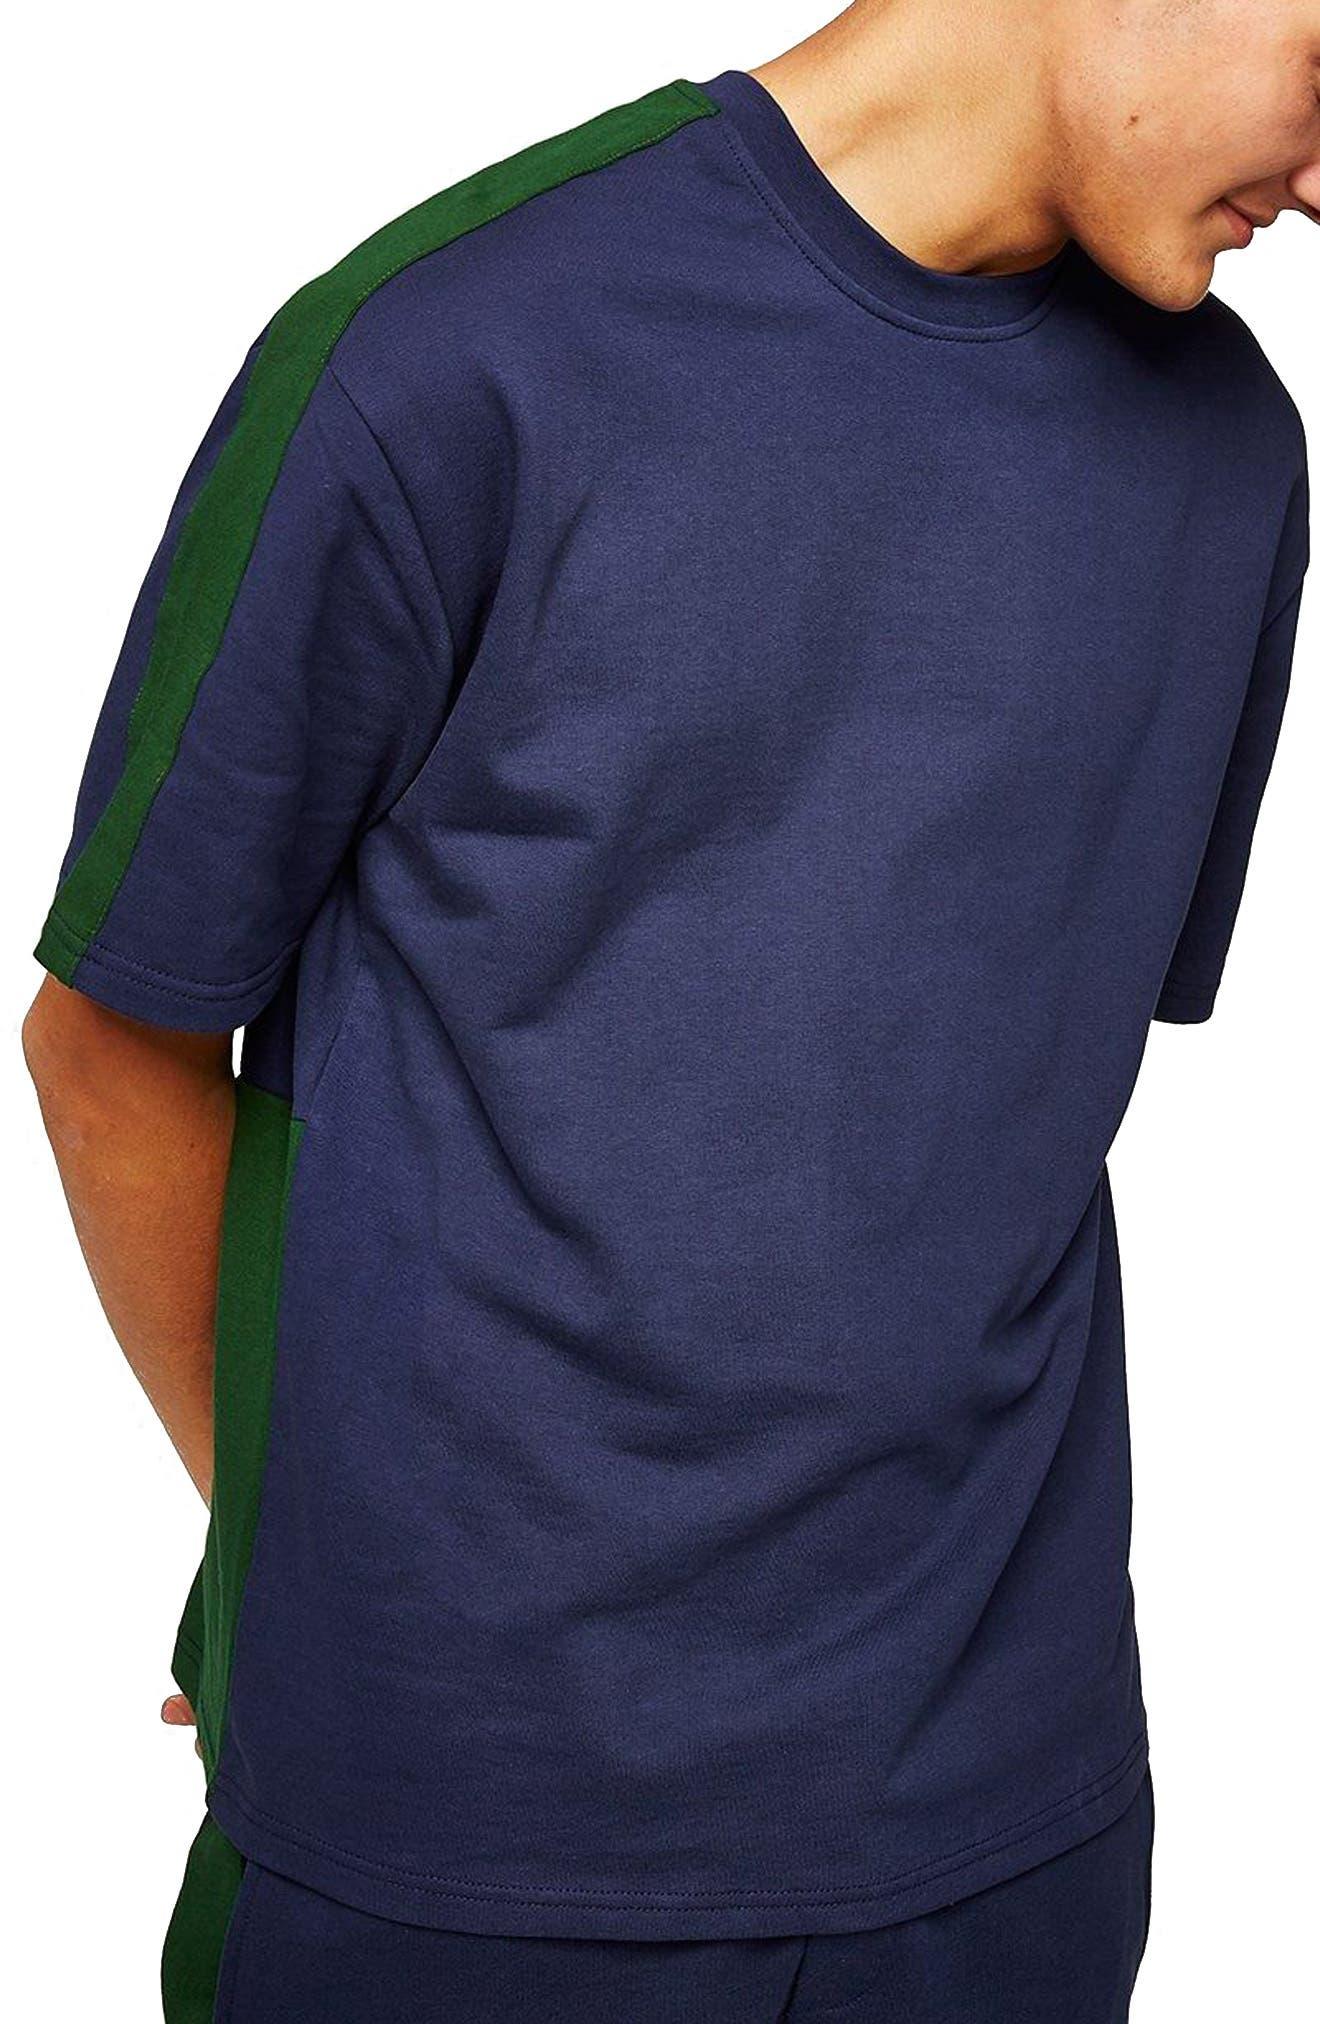 Colorblock Short Sleeve Sweatshirt,                         Main,                         color, Navy Blue Multi